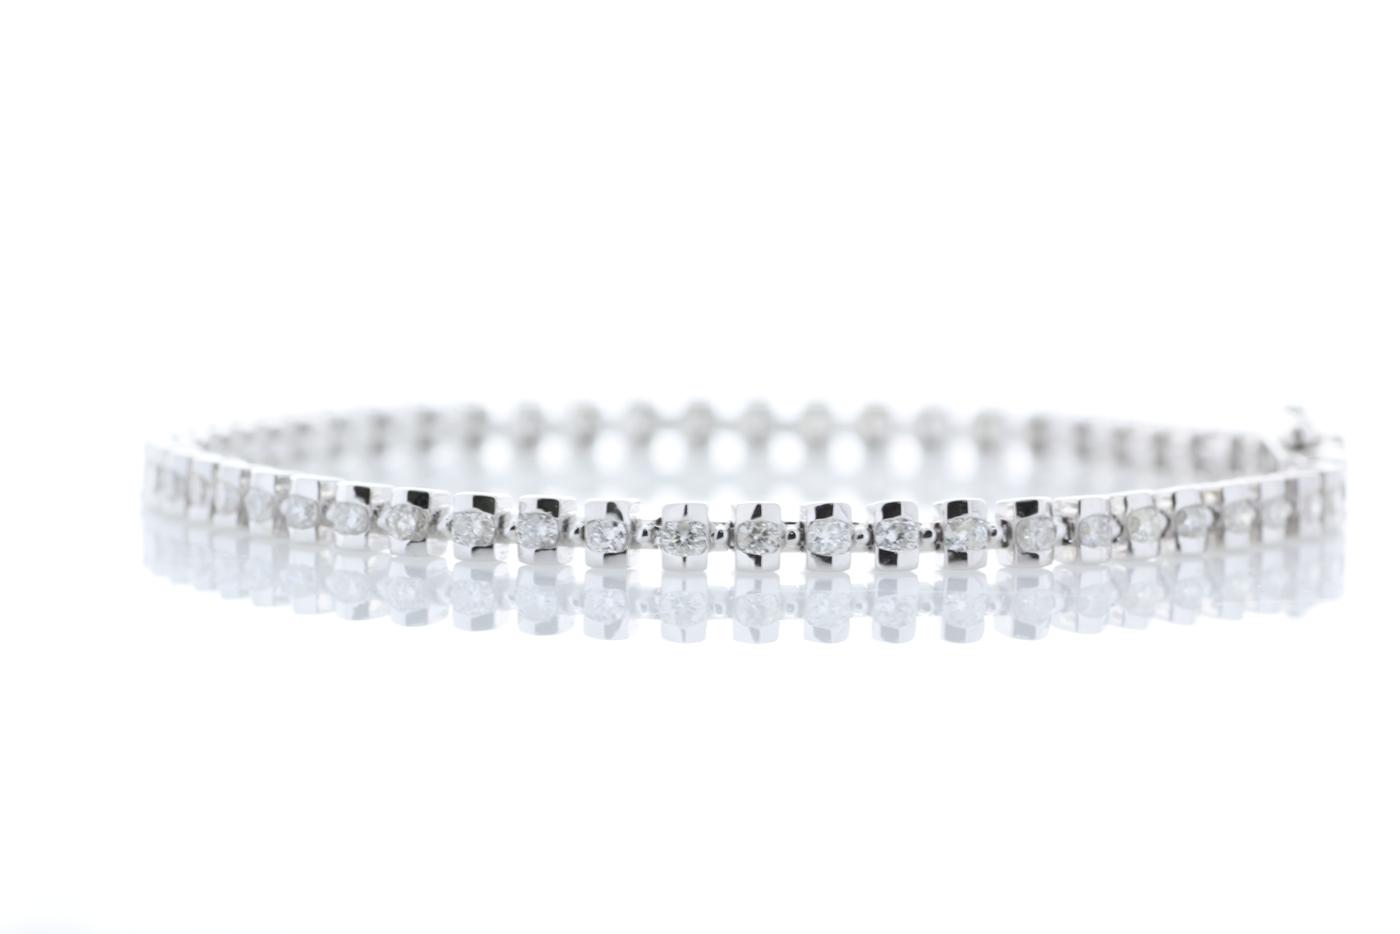 18ct White Gold Tennis Diamond Bracelet 1.82 Carats - Image 2 of 4